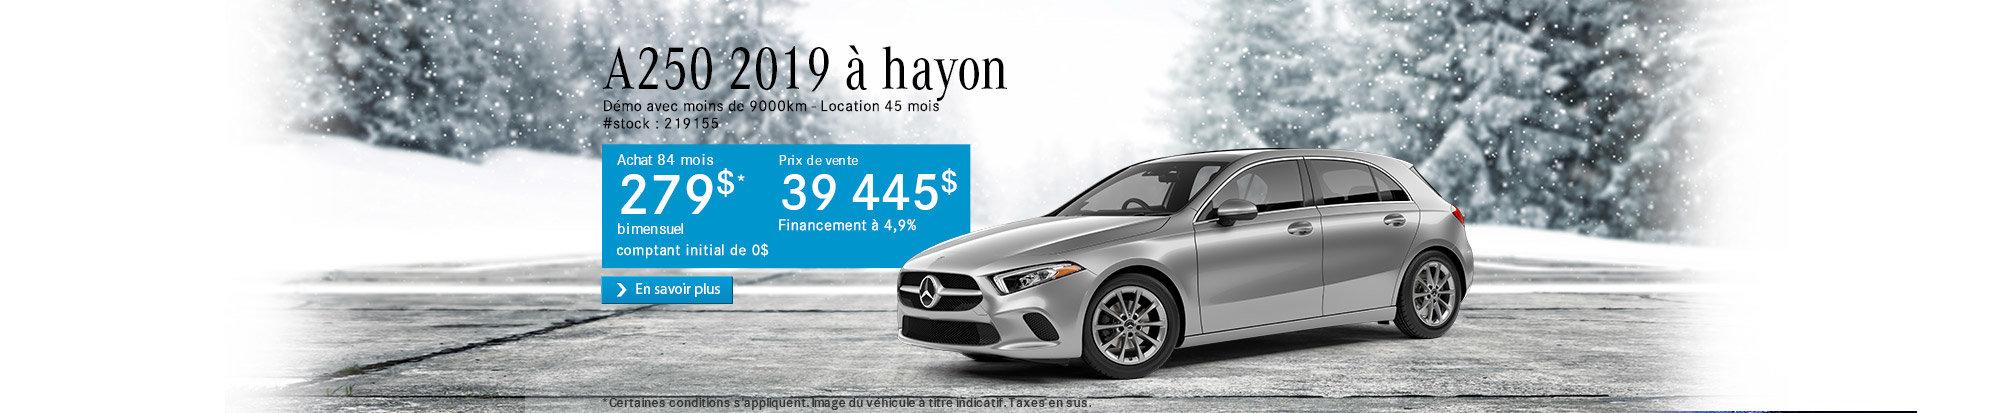 A250 à hayon 2019 - header